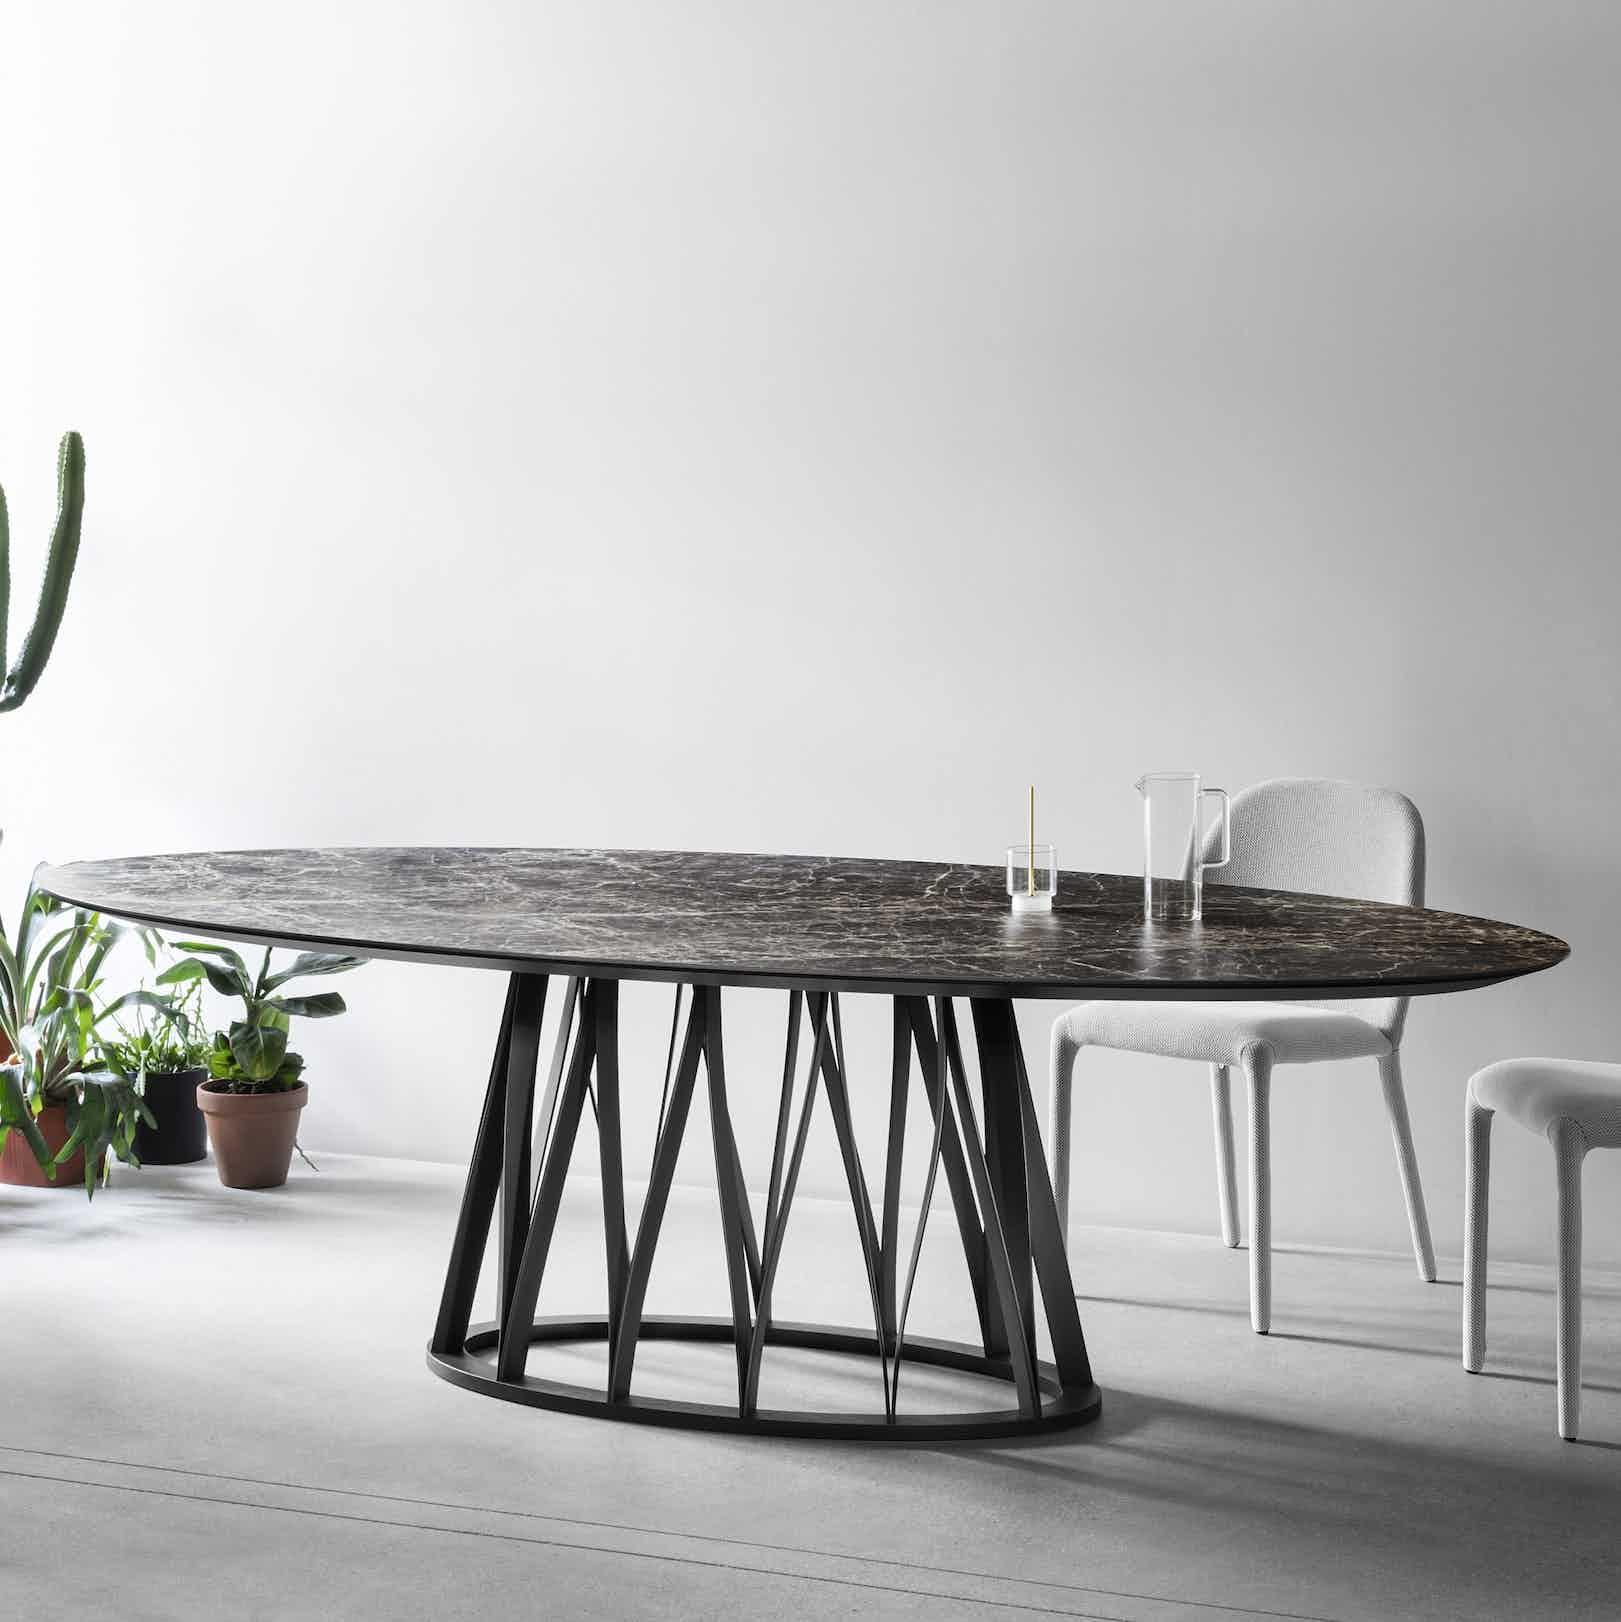 Miniforms acco table brown insitu haute living